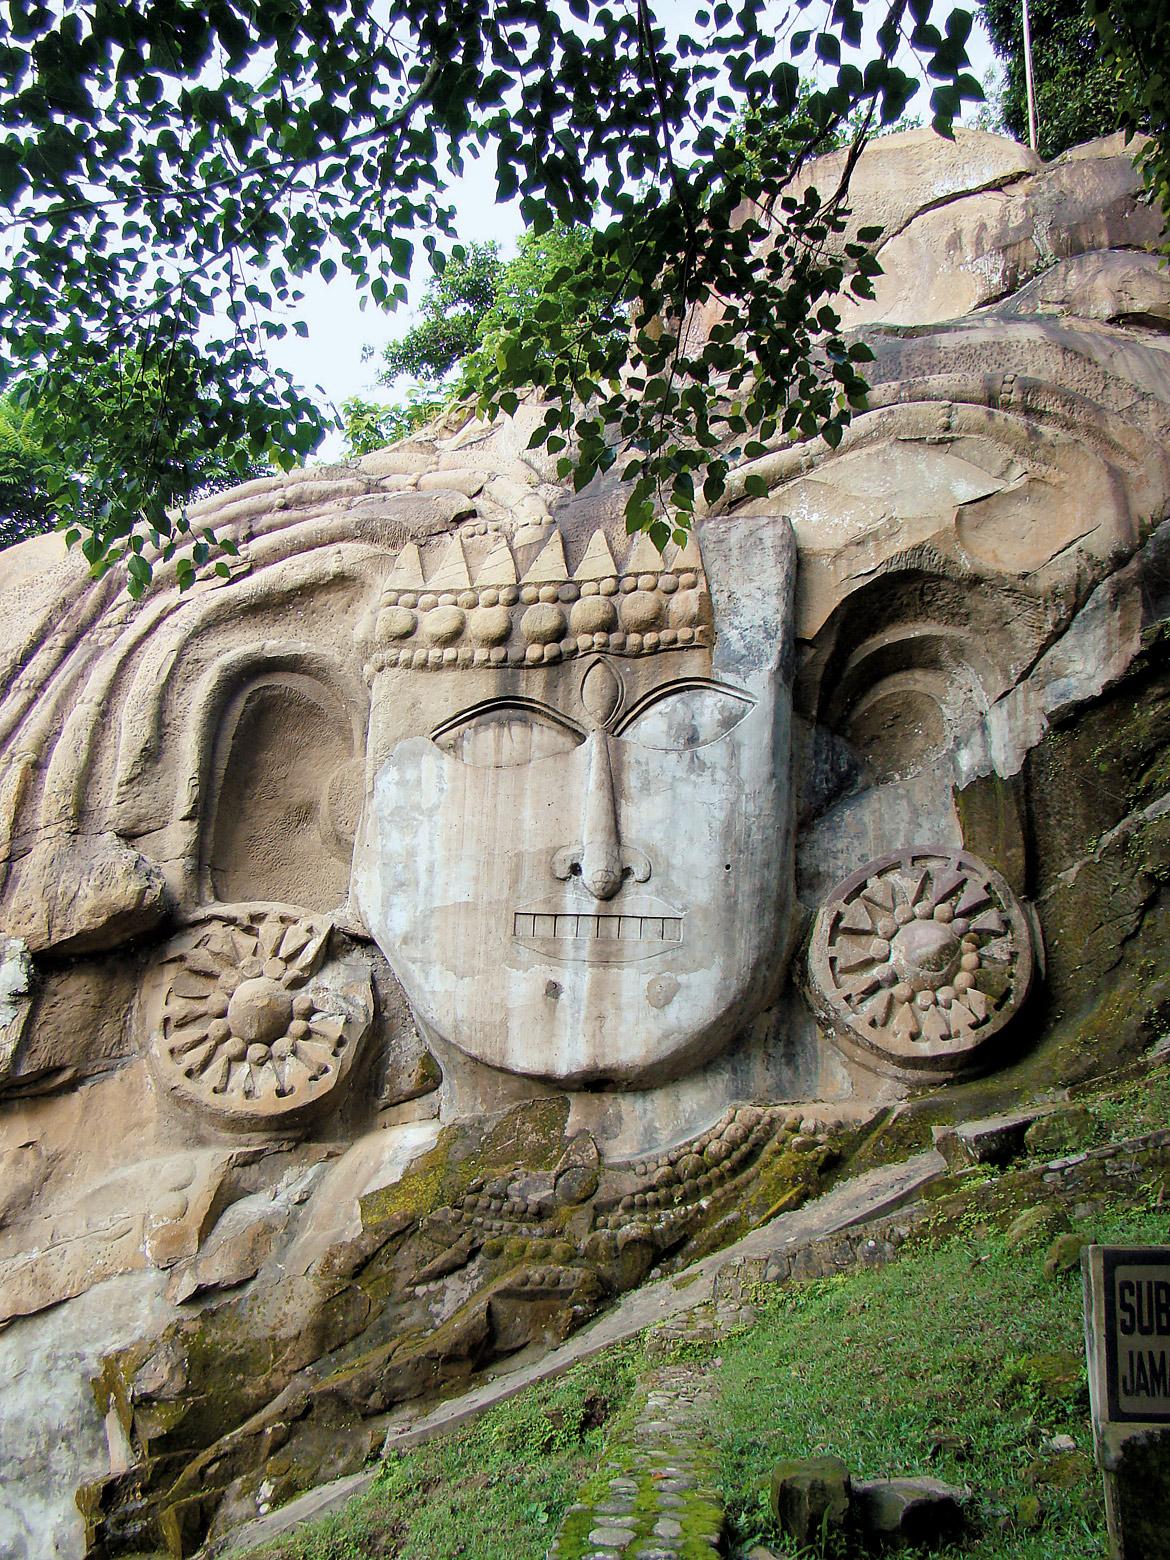 Rock-cut sculpture at Unakoti, Tripura